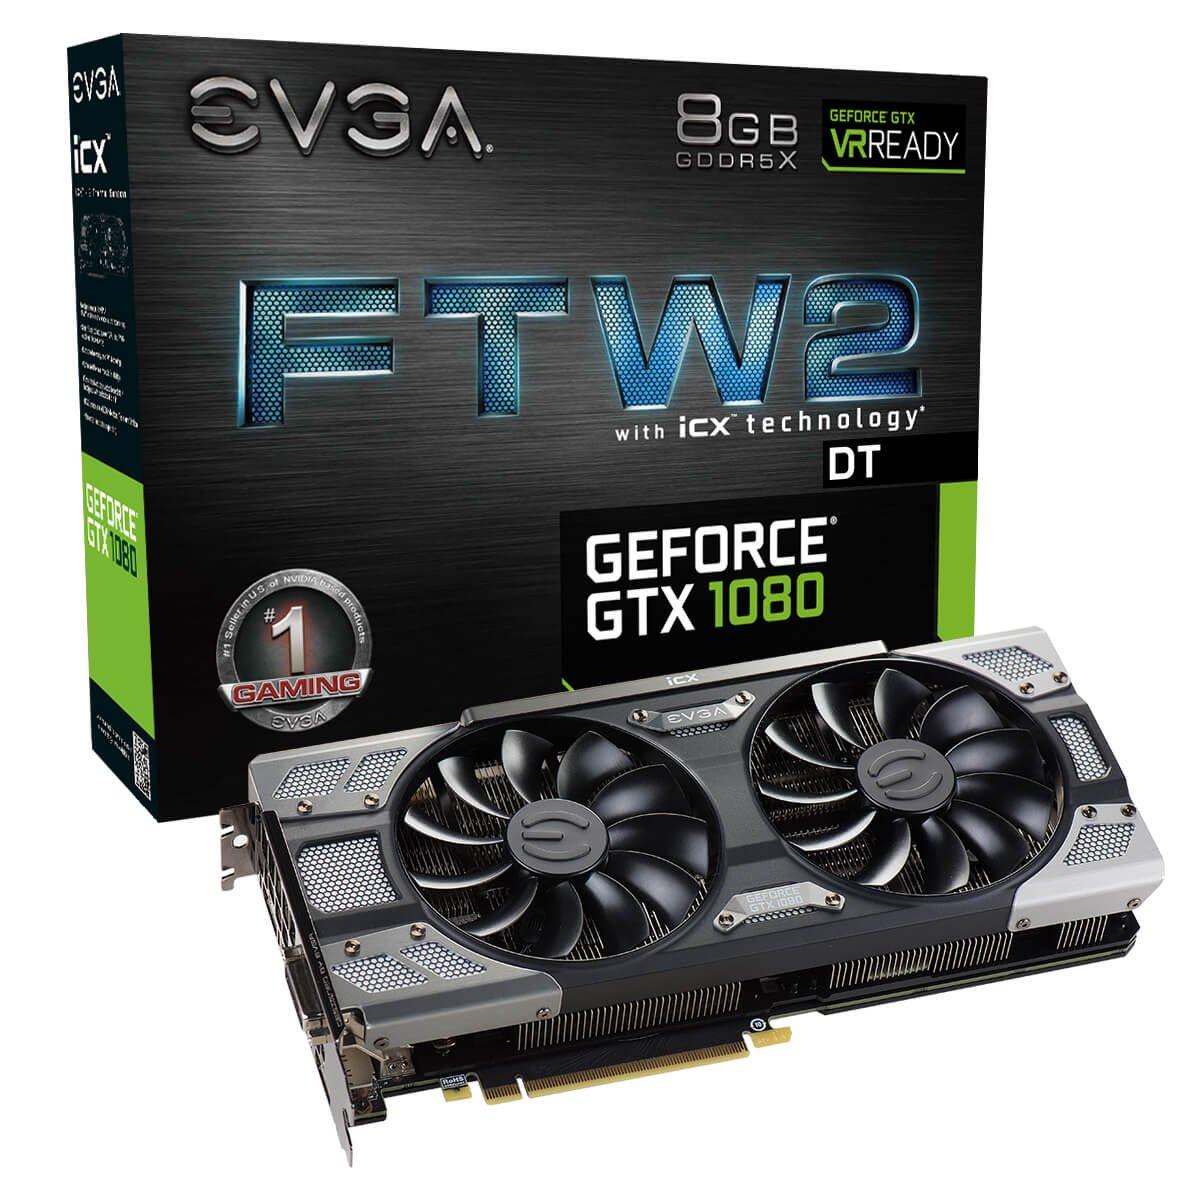 EVGA GeForce GTX 1080 FTW2 GAMING, 8GB GDDR5X, iCX Technology - 9 Thermal Sensors & RGB LED G/P/M, Aysnch Fan, Optimized Airflow Design Graphics Card 08G-P4-6686-KR